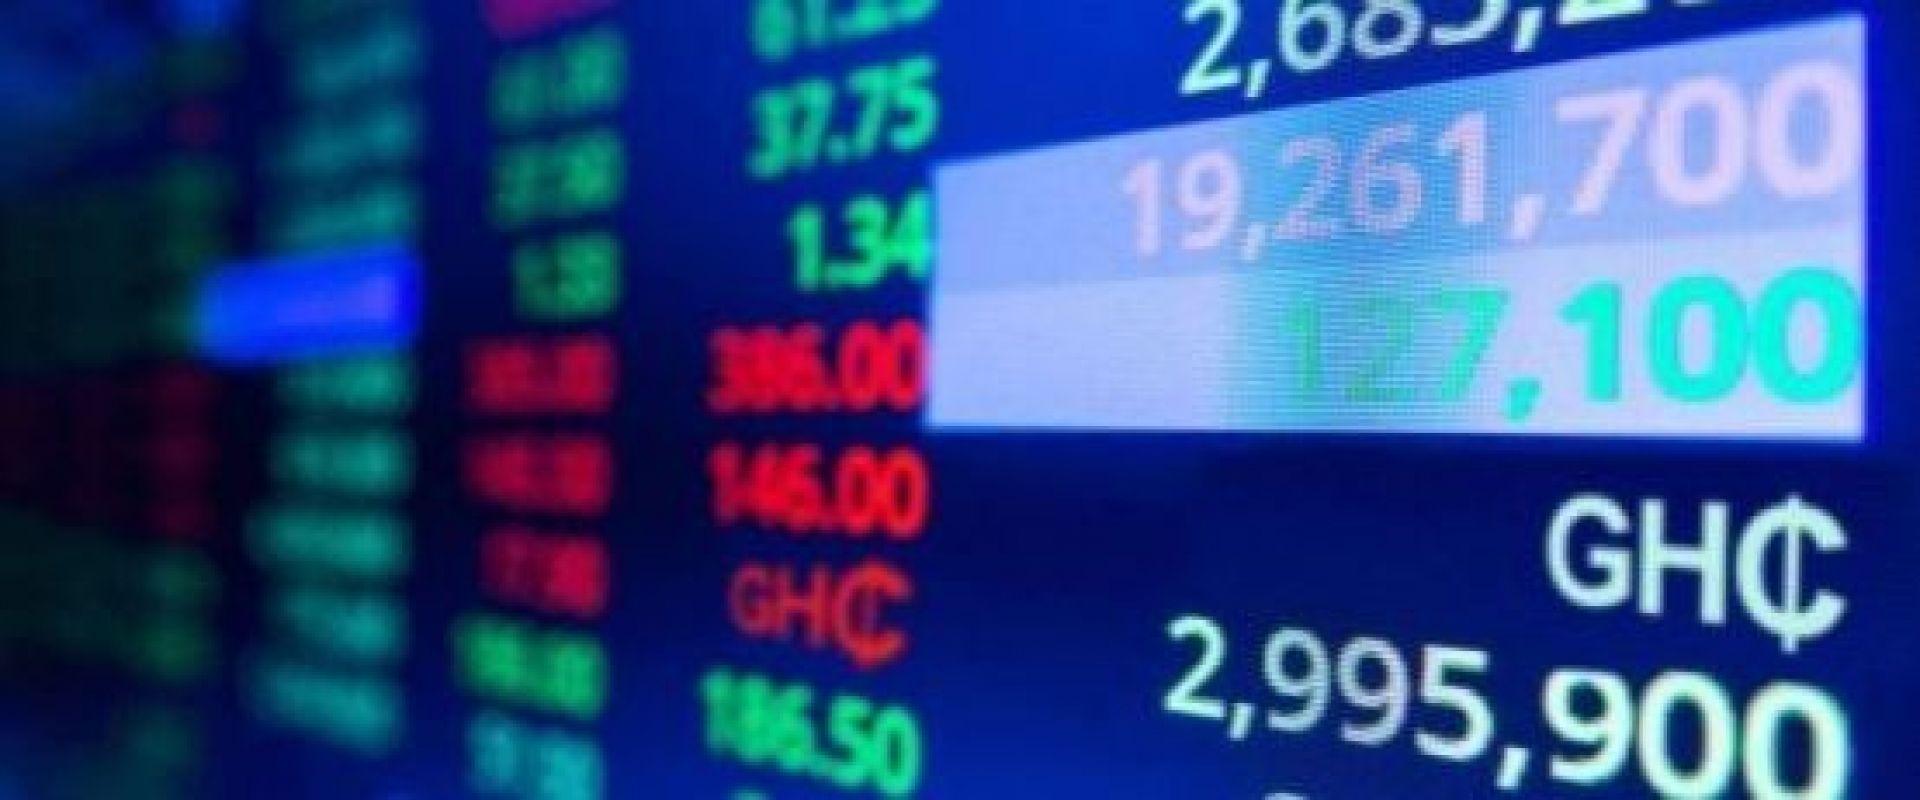 Operationalizing the Ghana Commodity Exchange image